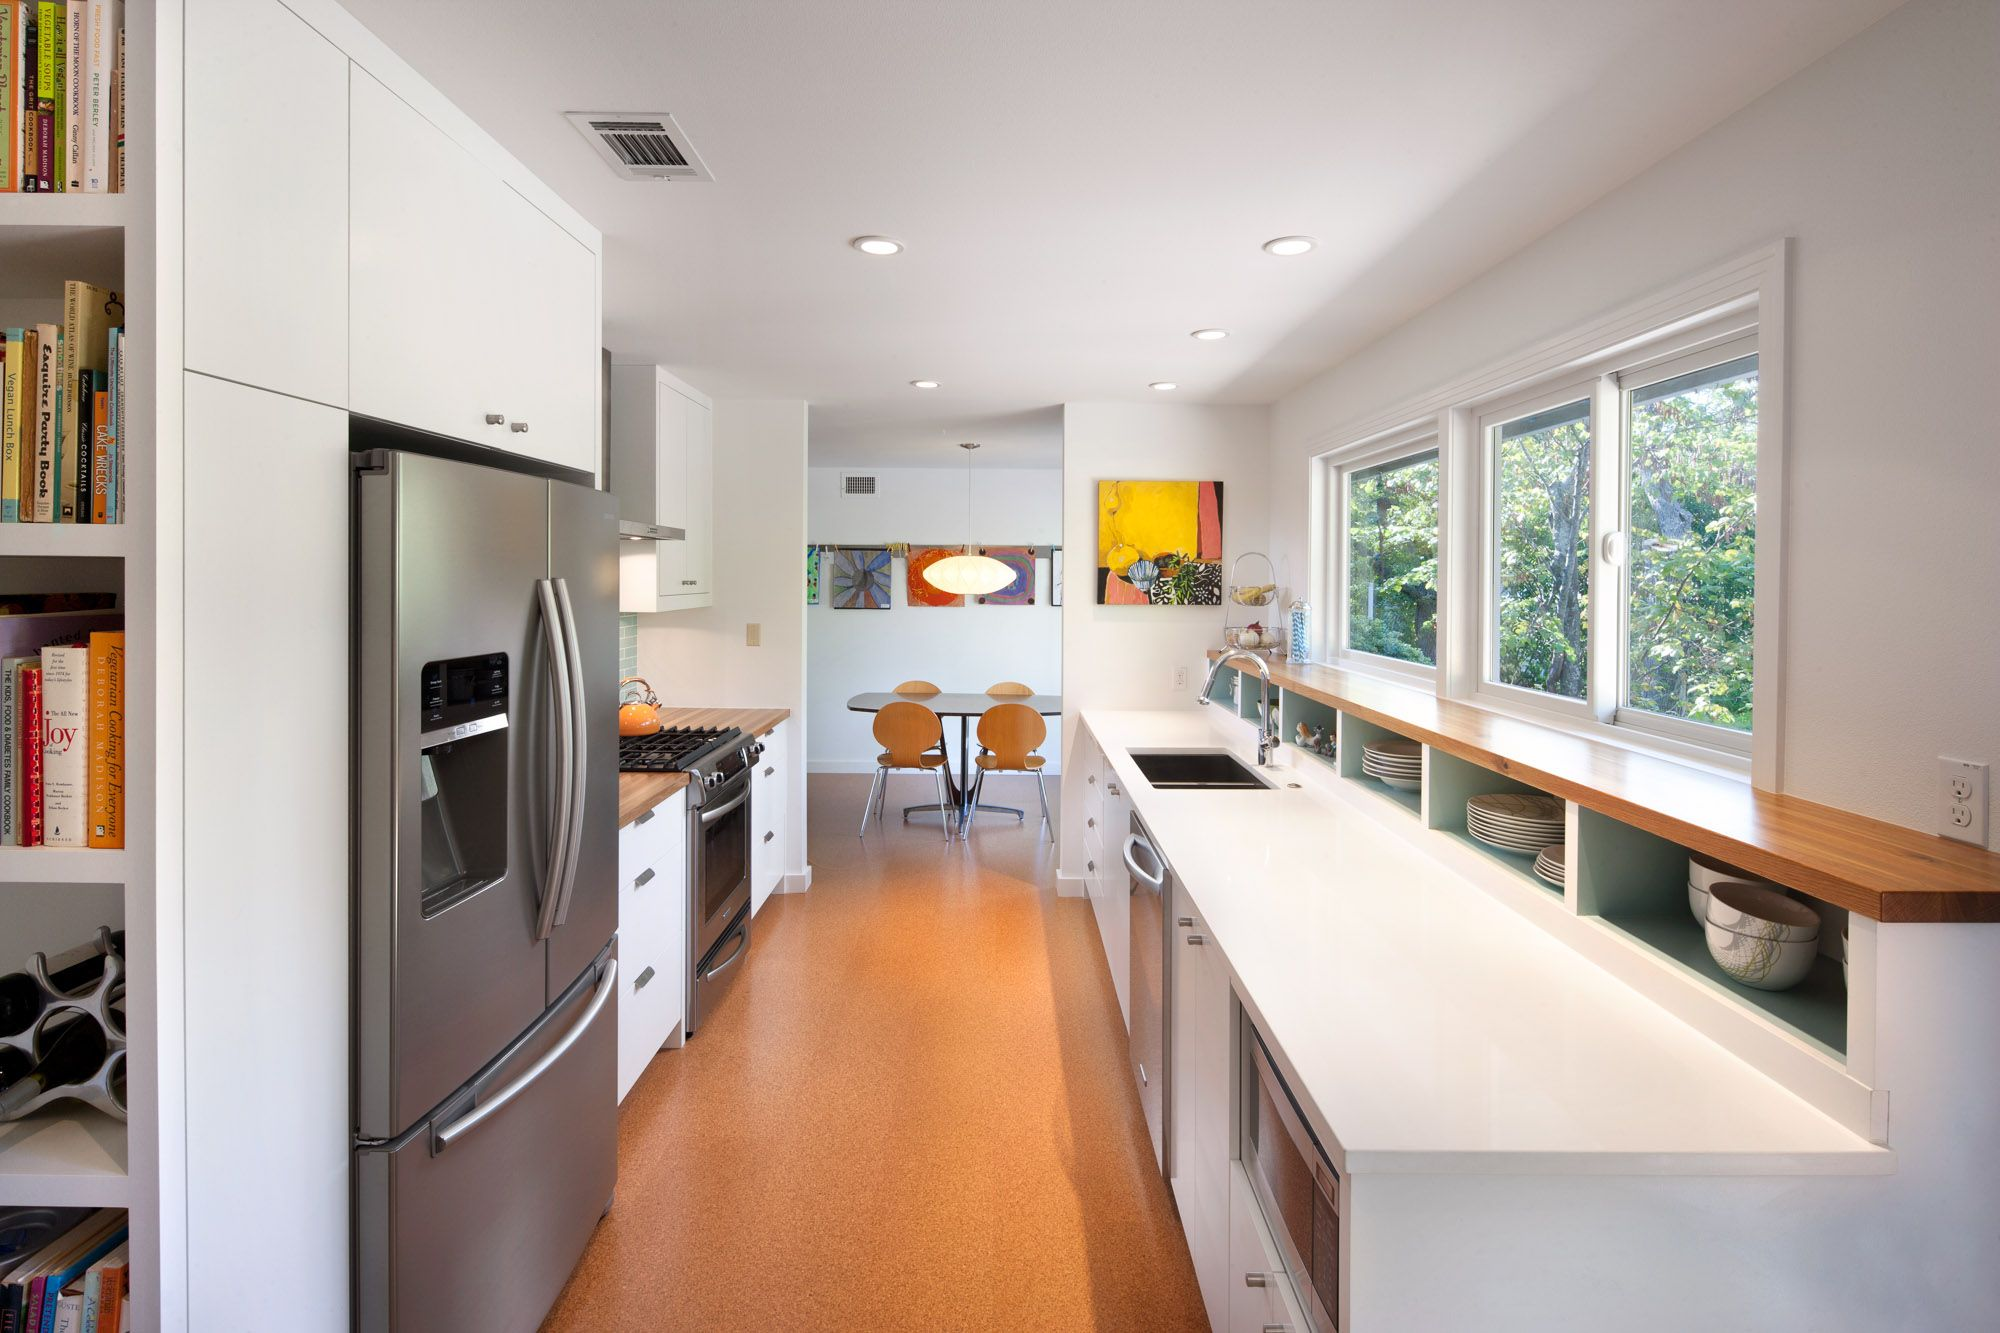 White Oak Wood Countertop Photo Gallery By Devos Custom Woodworking,King Bedroom Furniture Sets